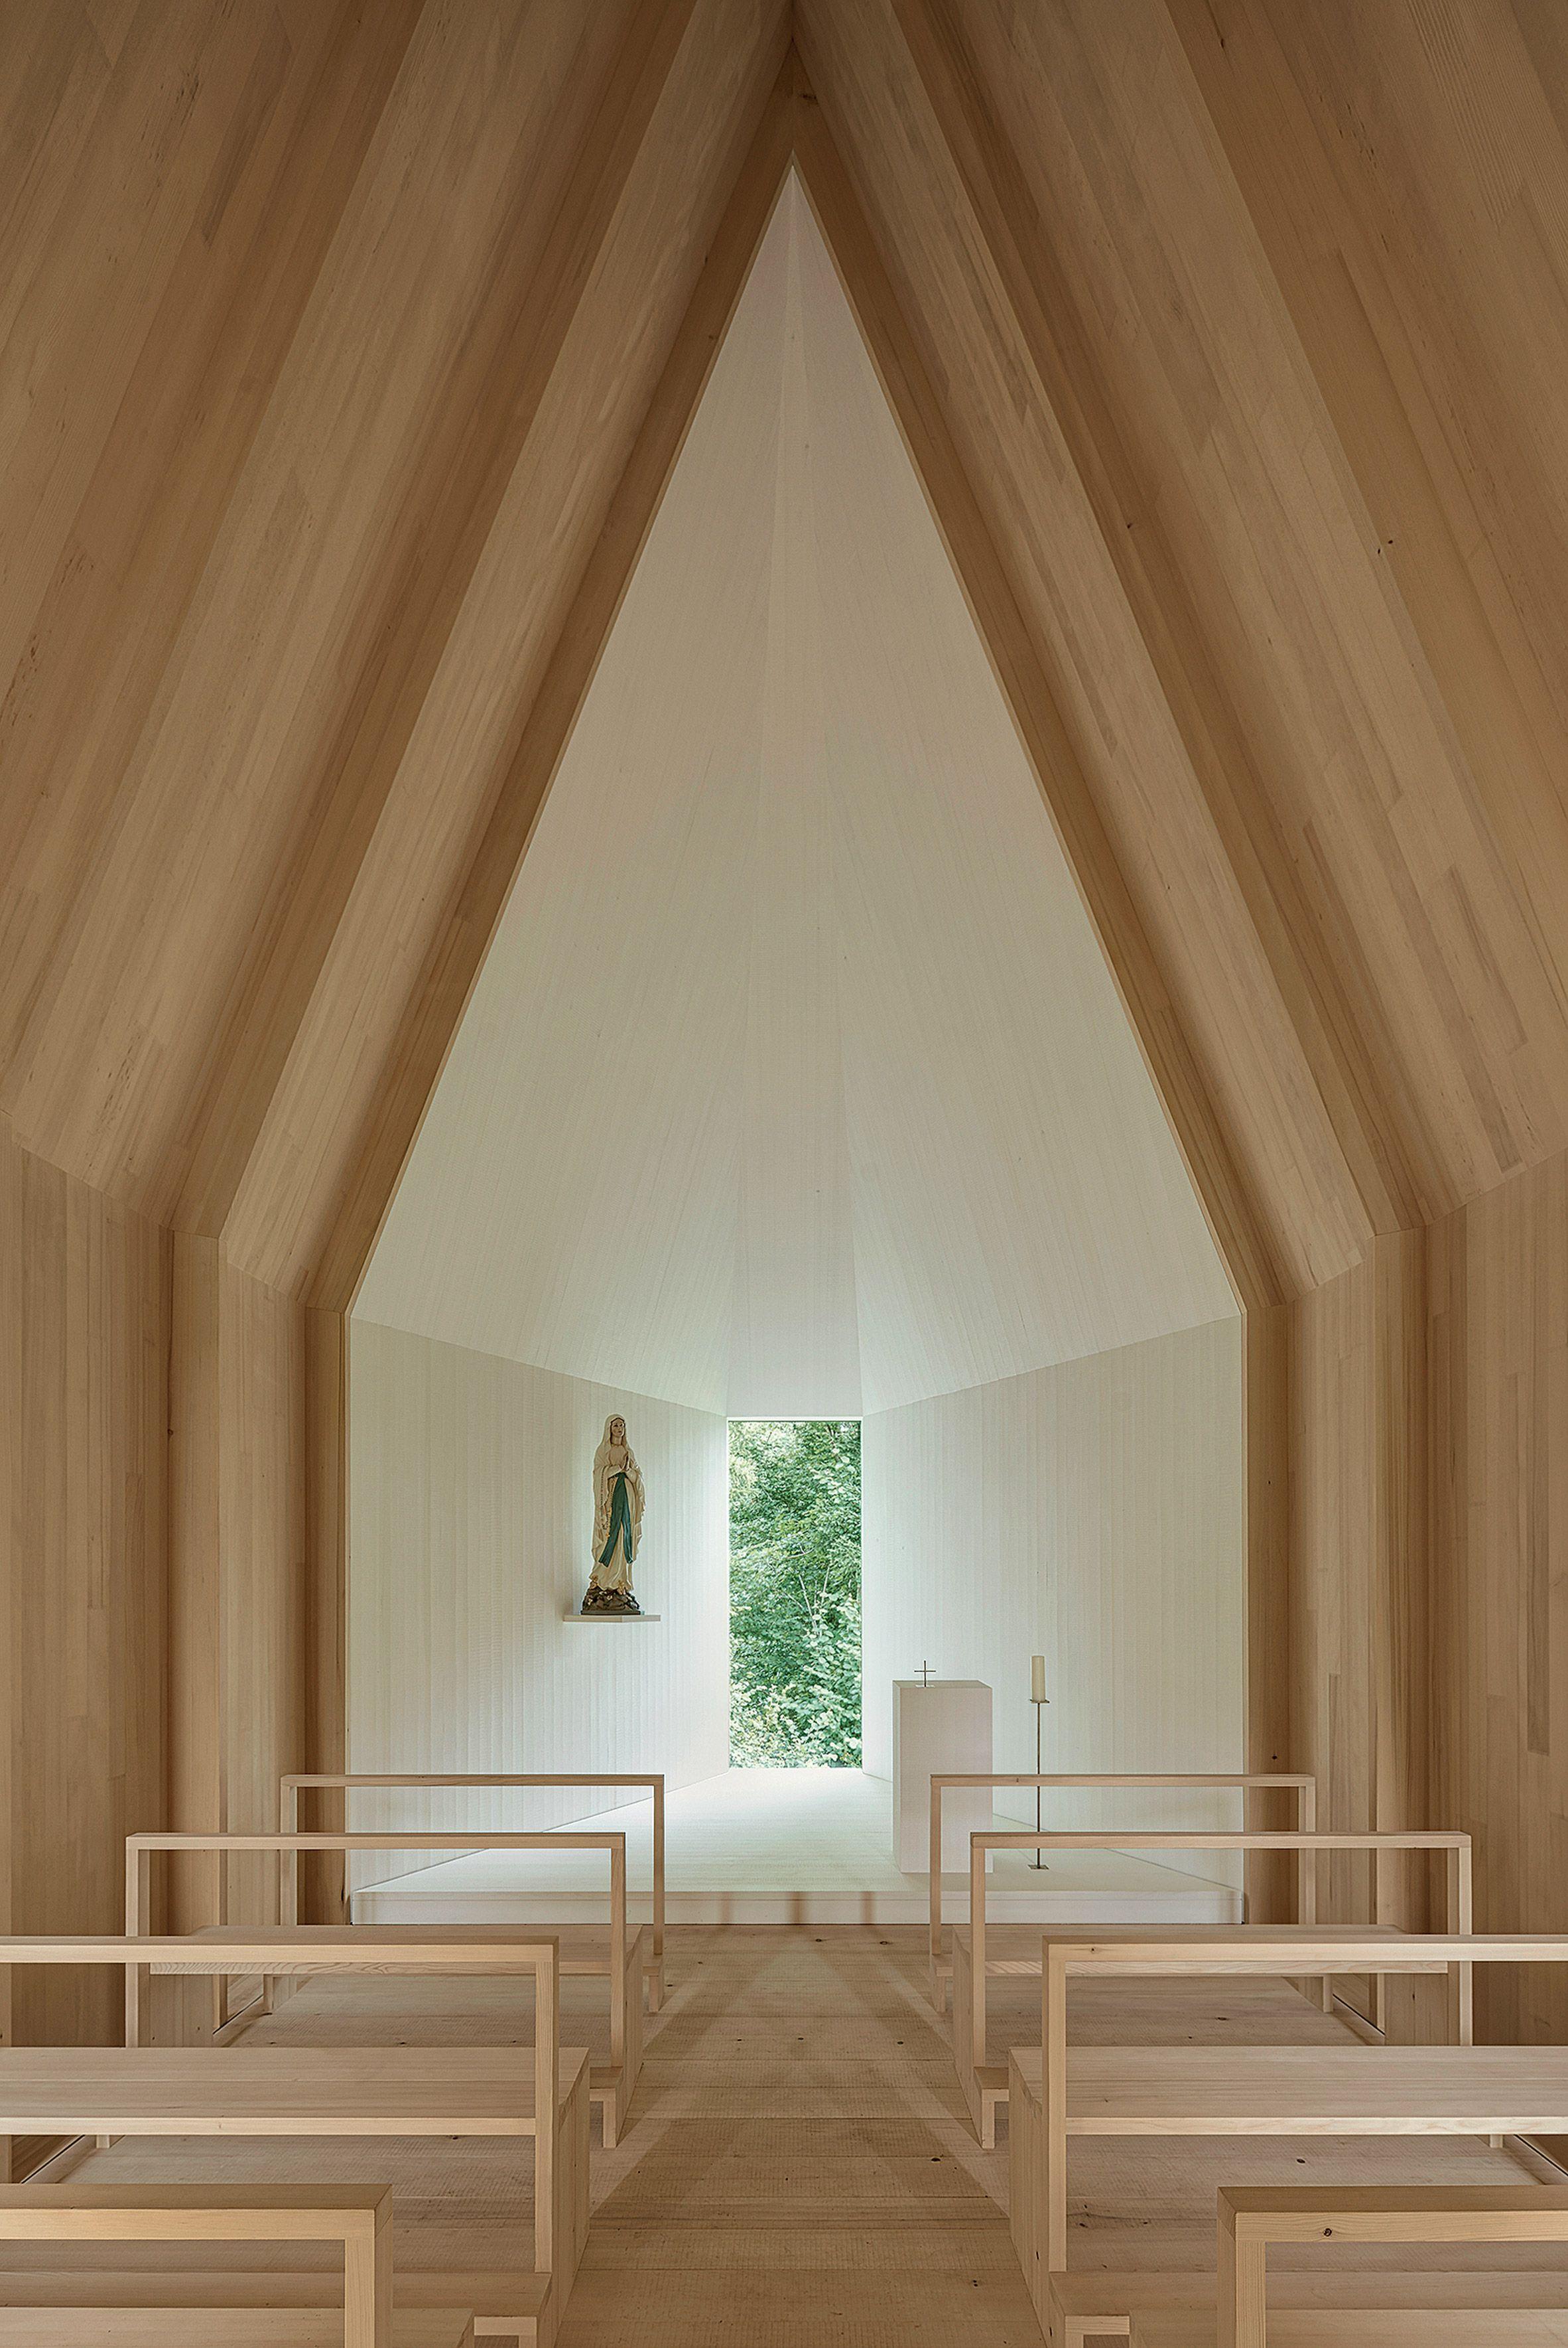 Kapelle Salgenreute By Bernardo Bader Interior Architecture Church Architecture Church Interior